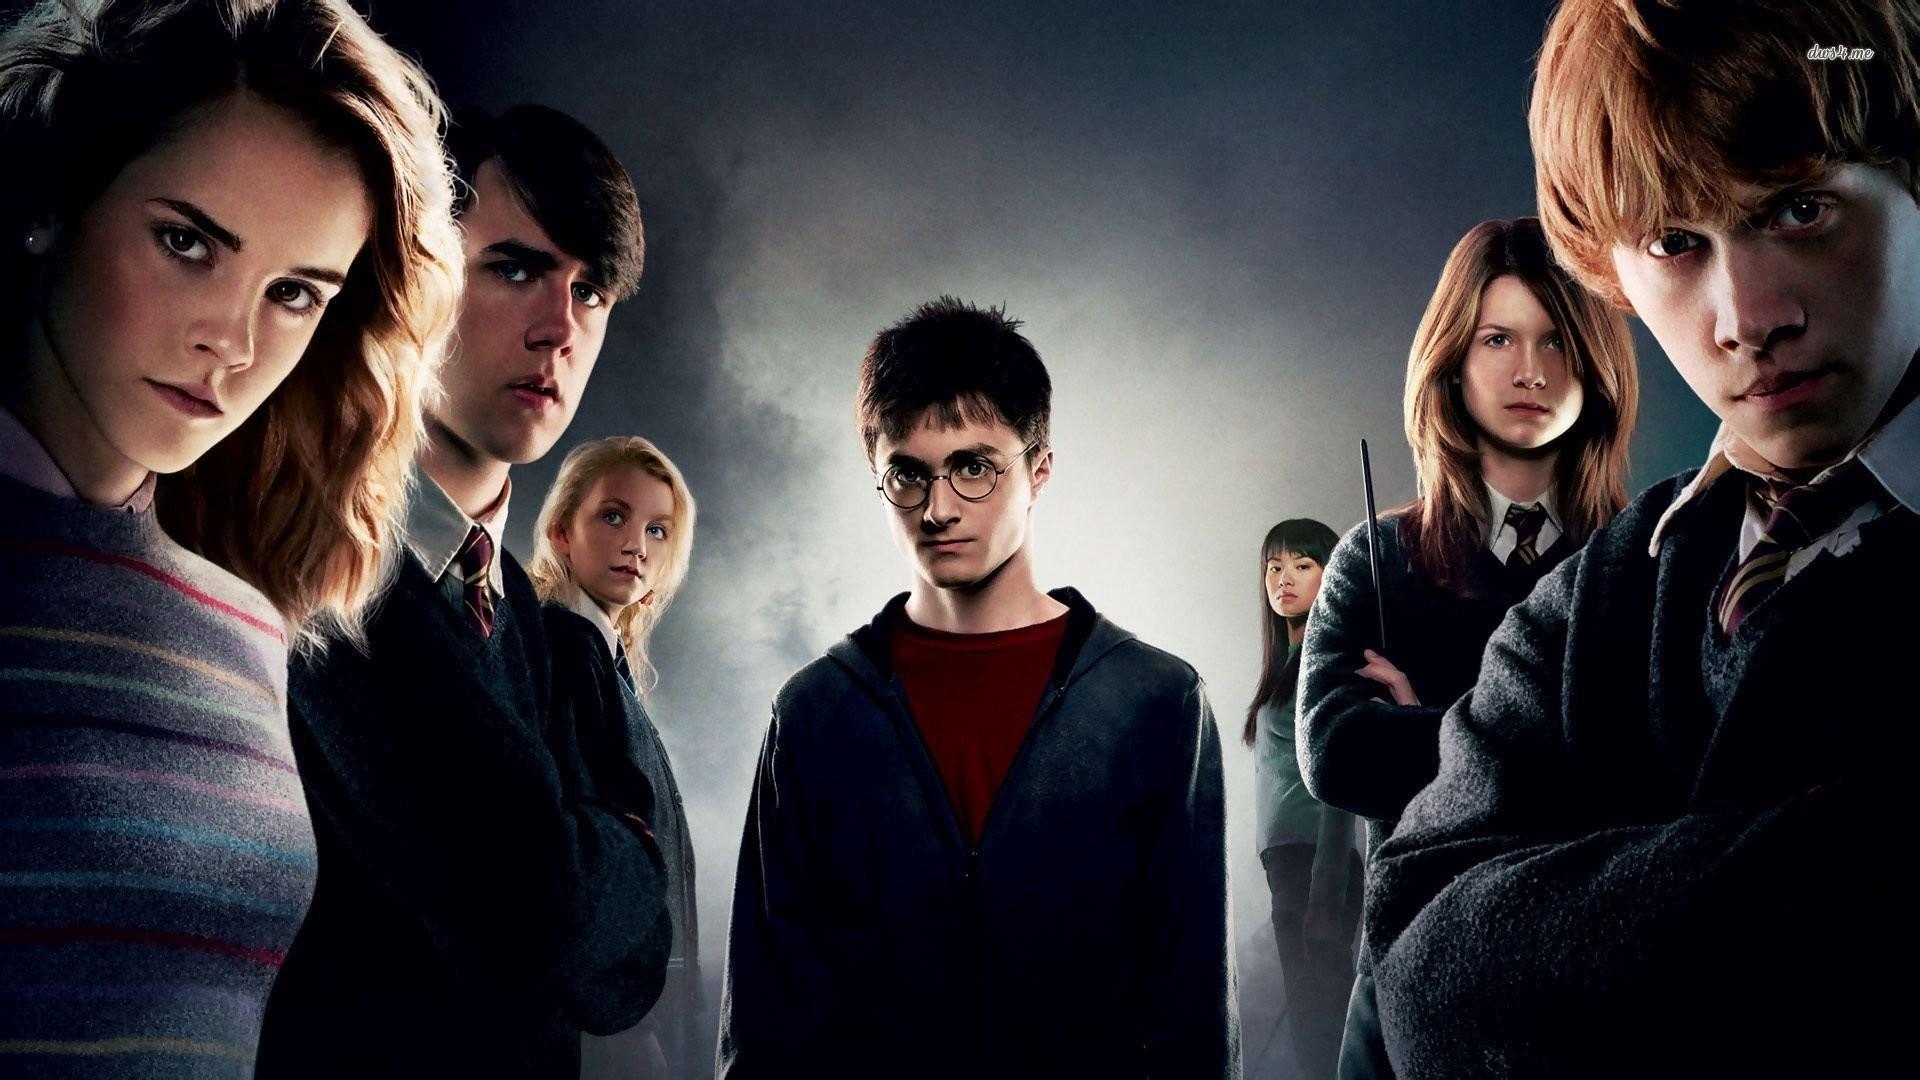 Harry Potter HD Desktop Wallpapers for